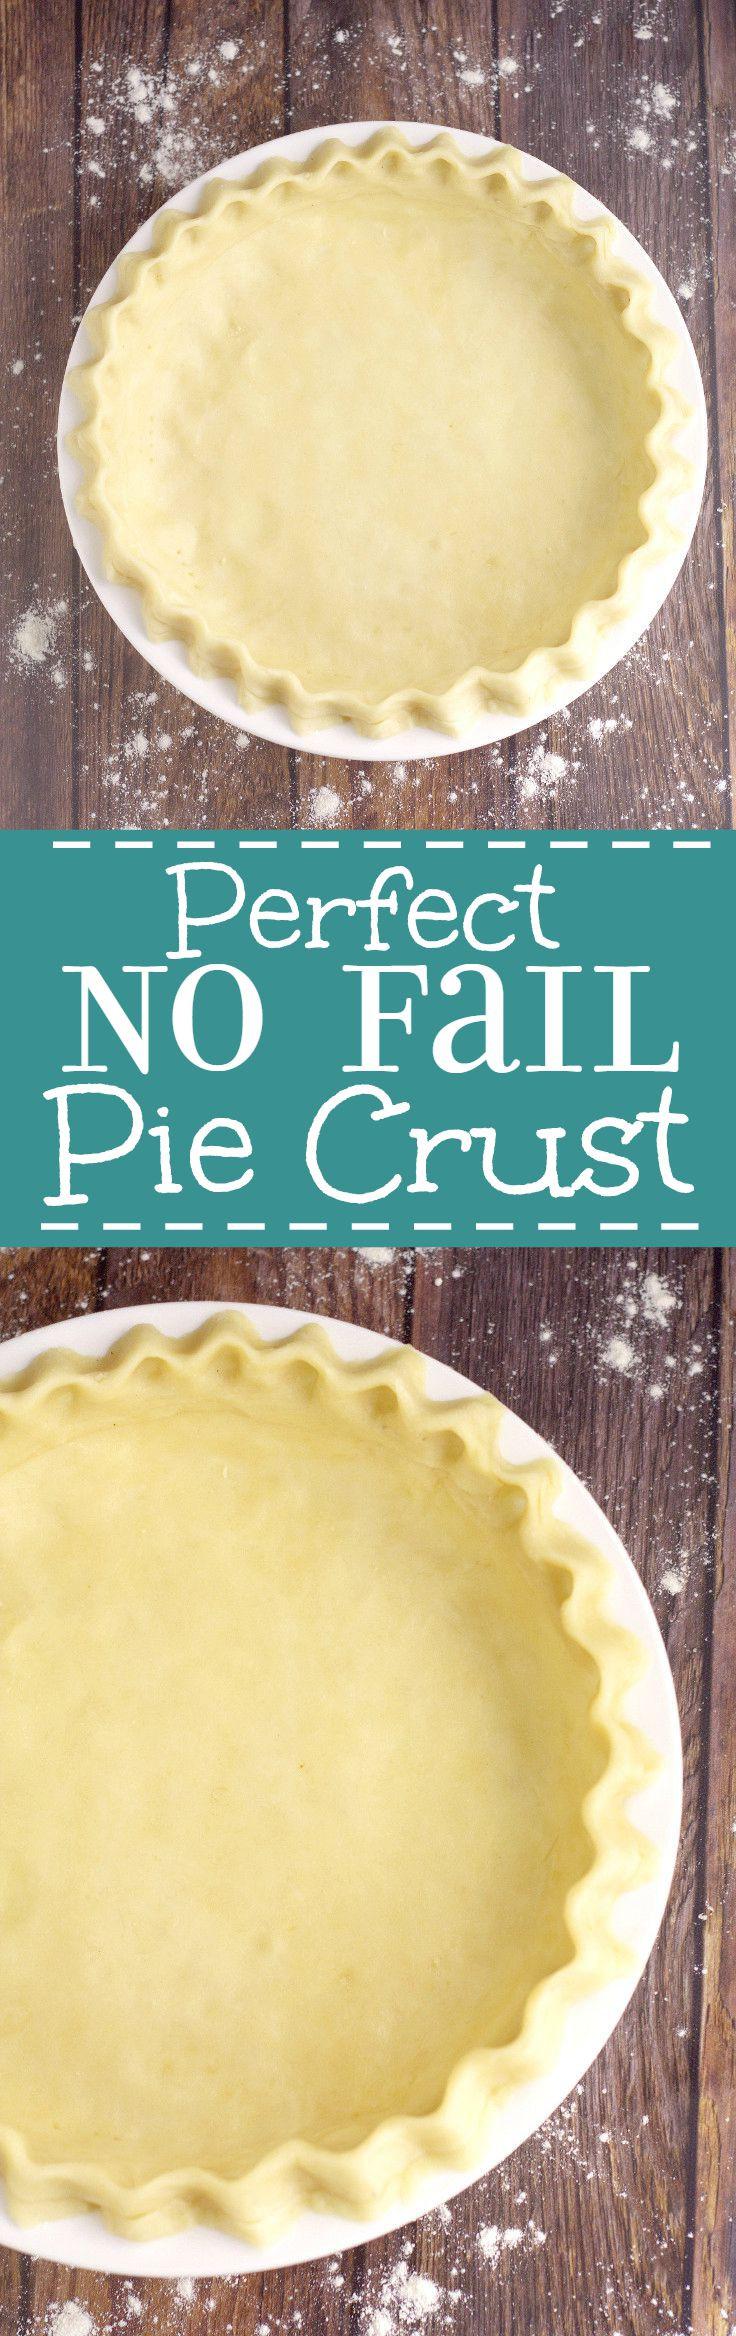 Recipes With Pie Crust  pany s ing pie crust recipe